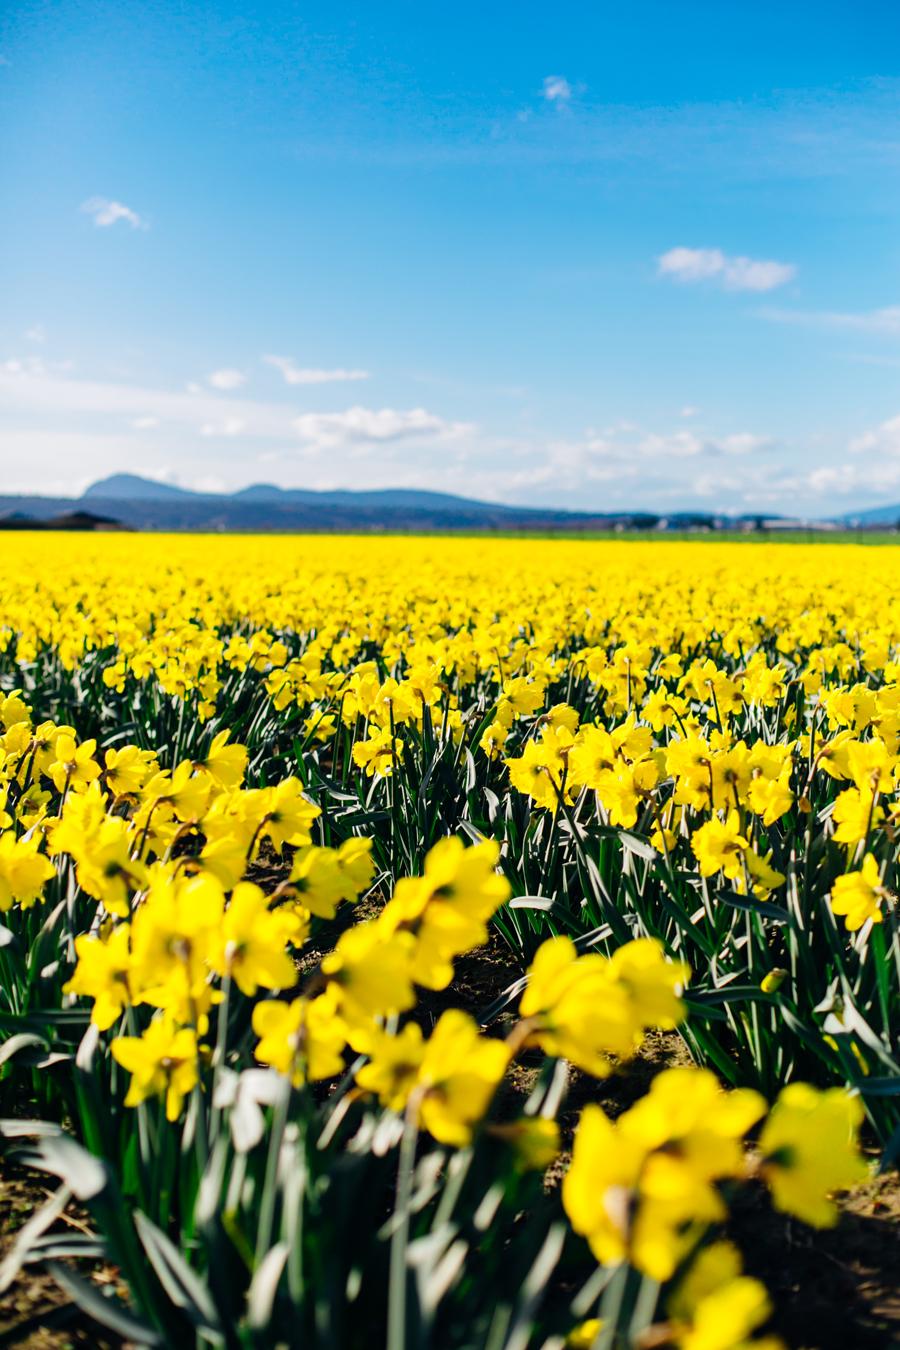 001-skagit-vallery-mount-vernon-washington-daffodils-tulip-festival-katheryn-moran-photography.jpg